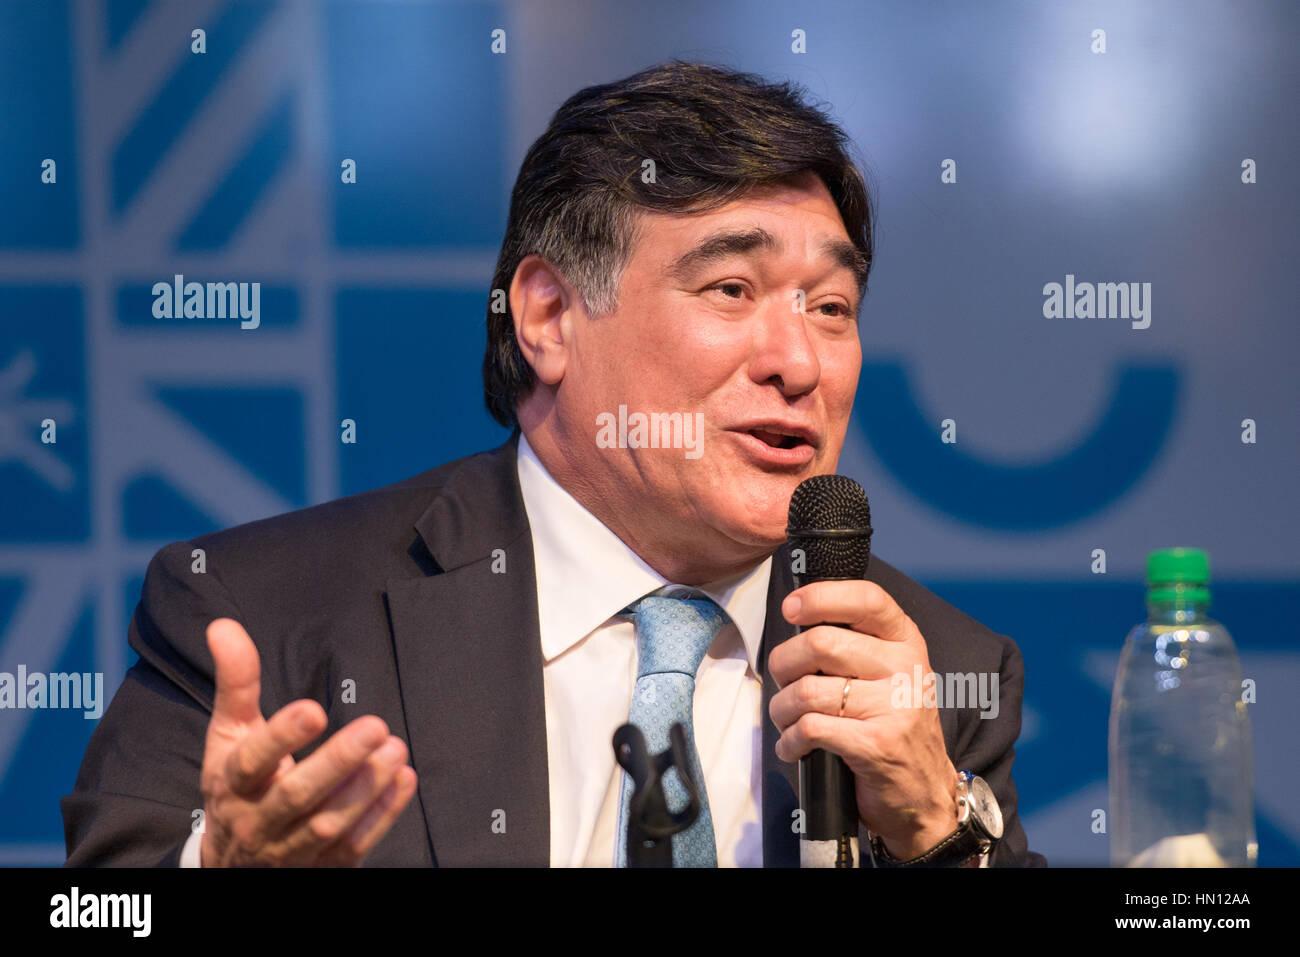 Buenos Aires, Argentina - Nov 5, 2015: Carlos Zannini during the presentation of book El rumbo by Jorge Rivas. - Stock Image